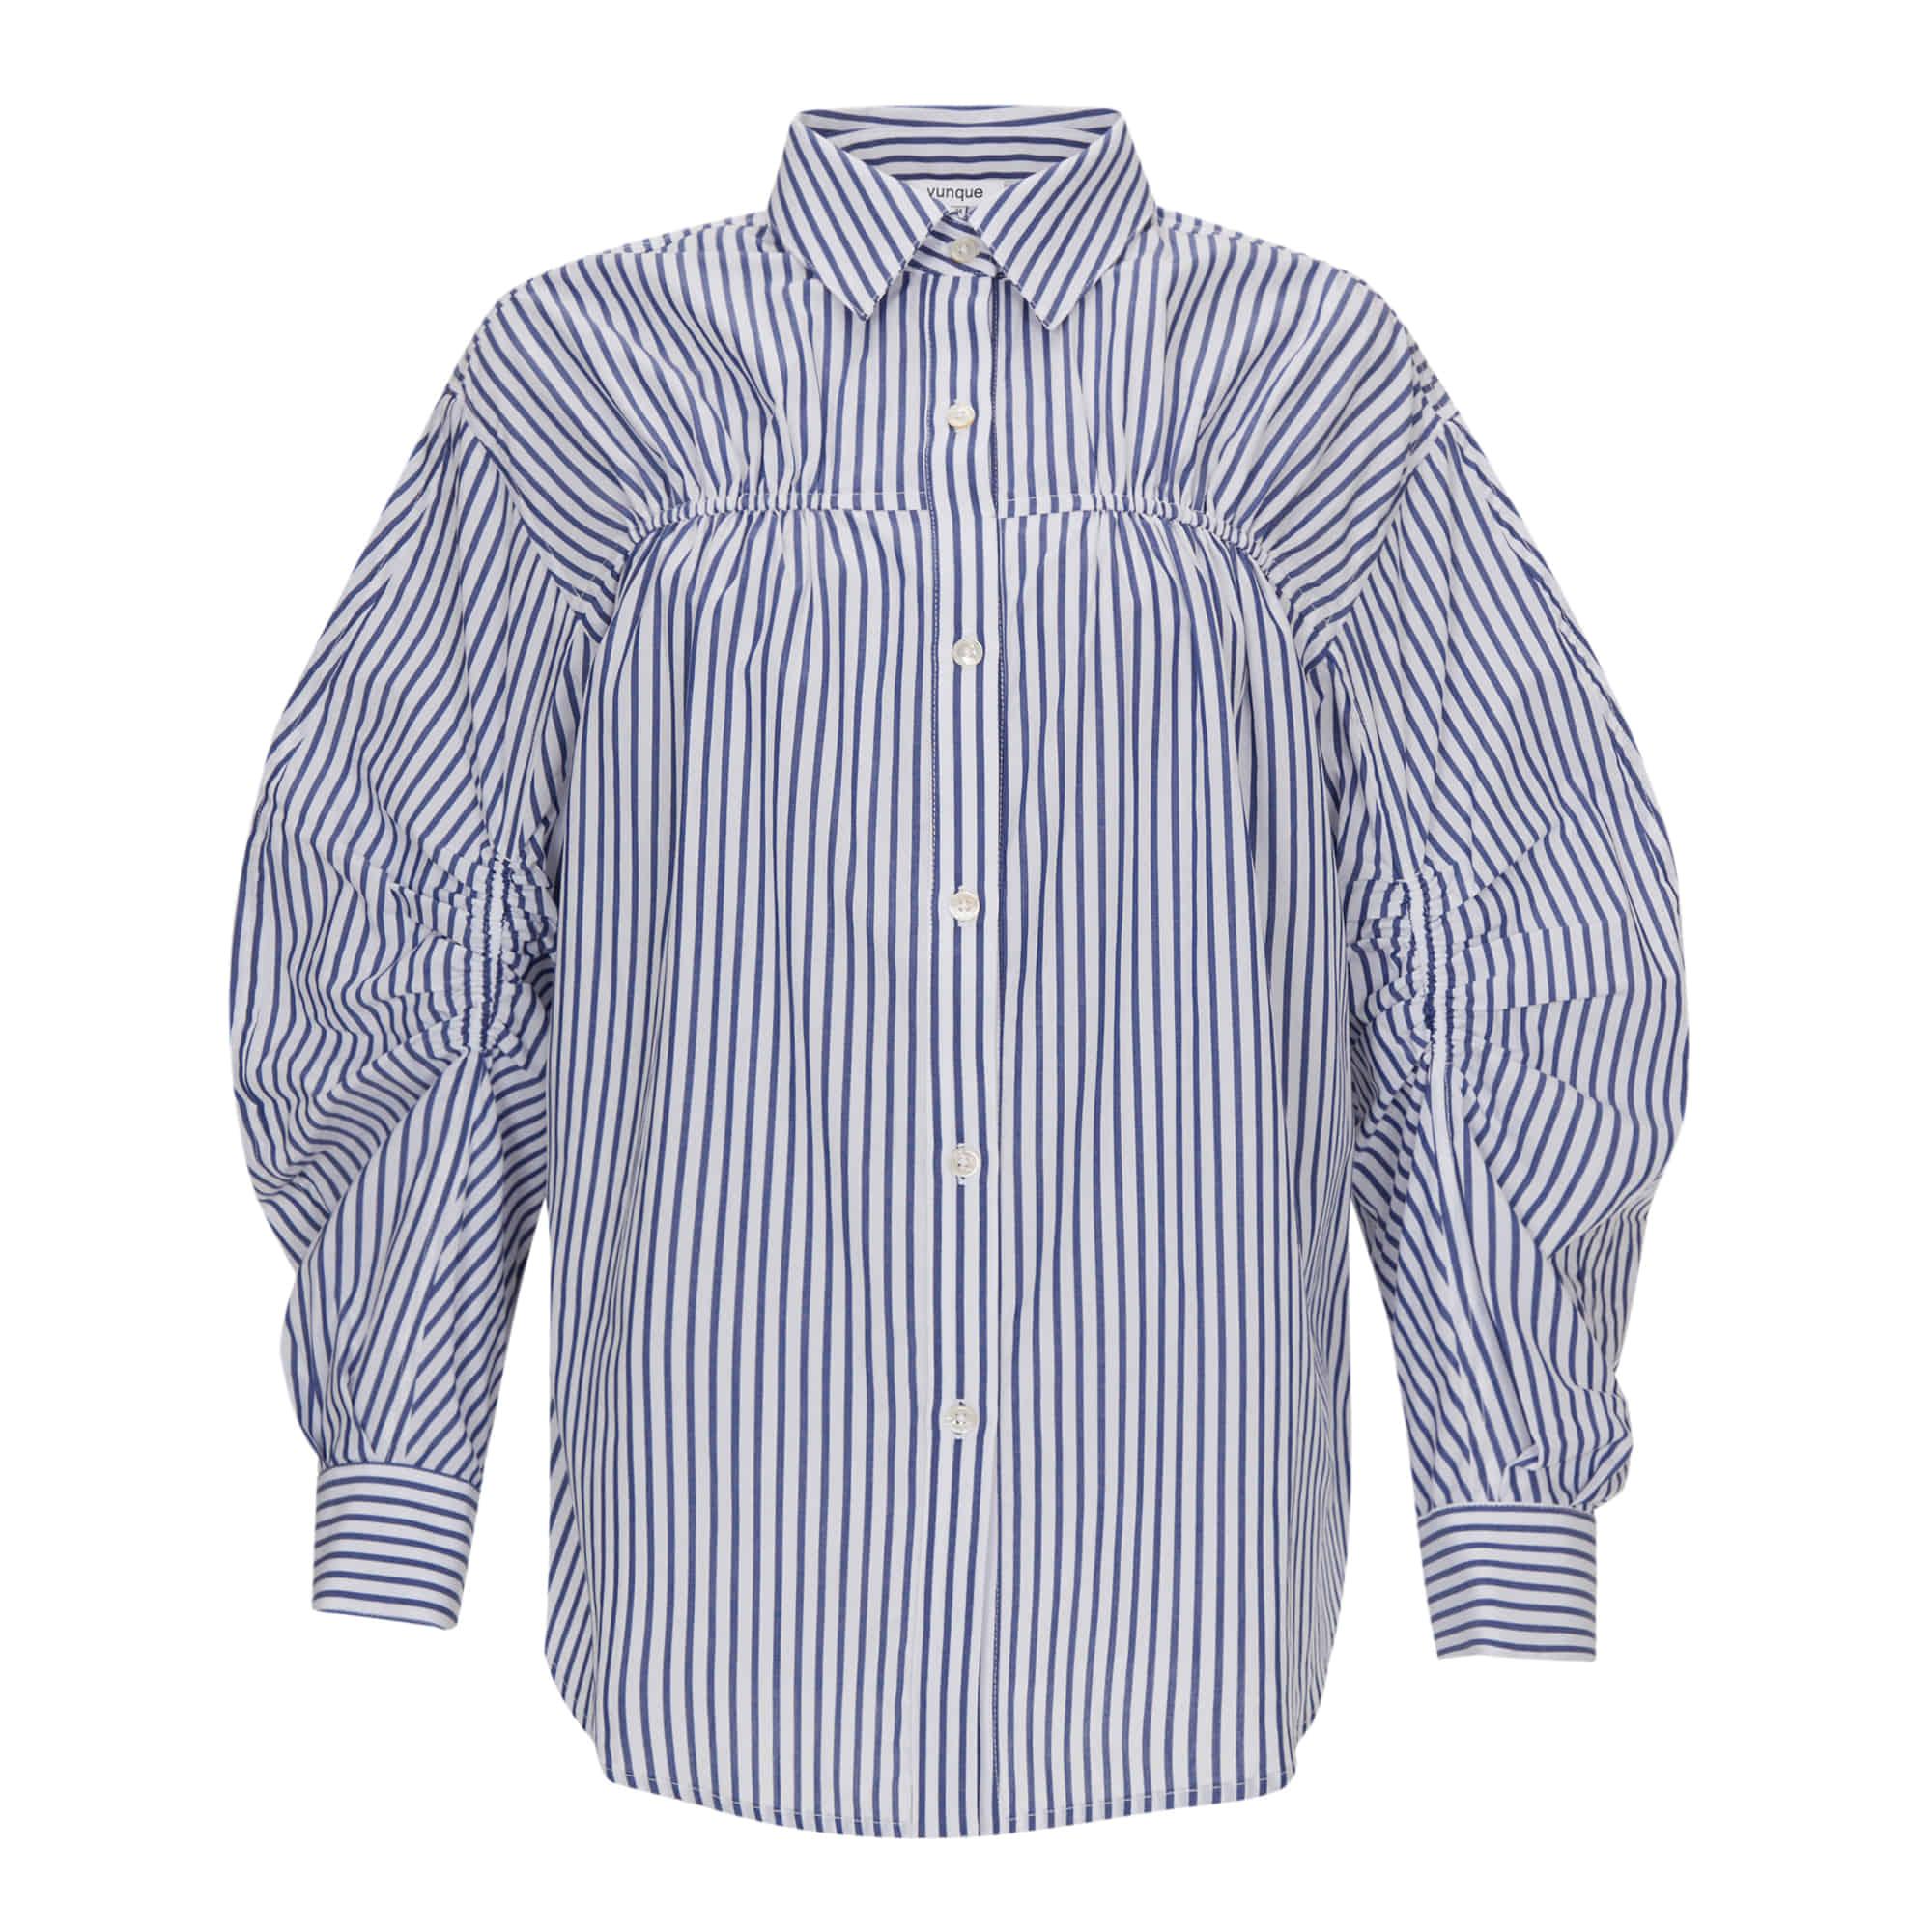 Bud Pleats Shirt (버드 플리츠 셔츠) Blue